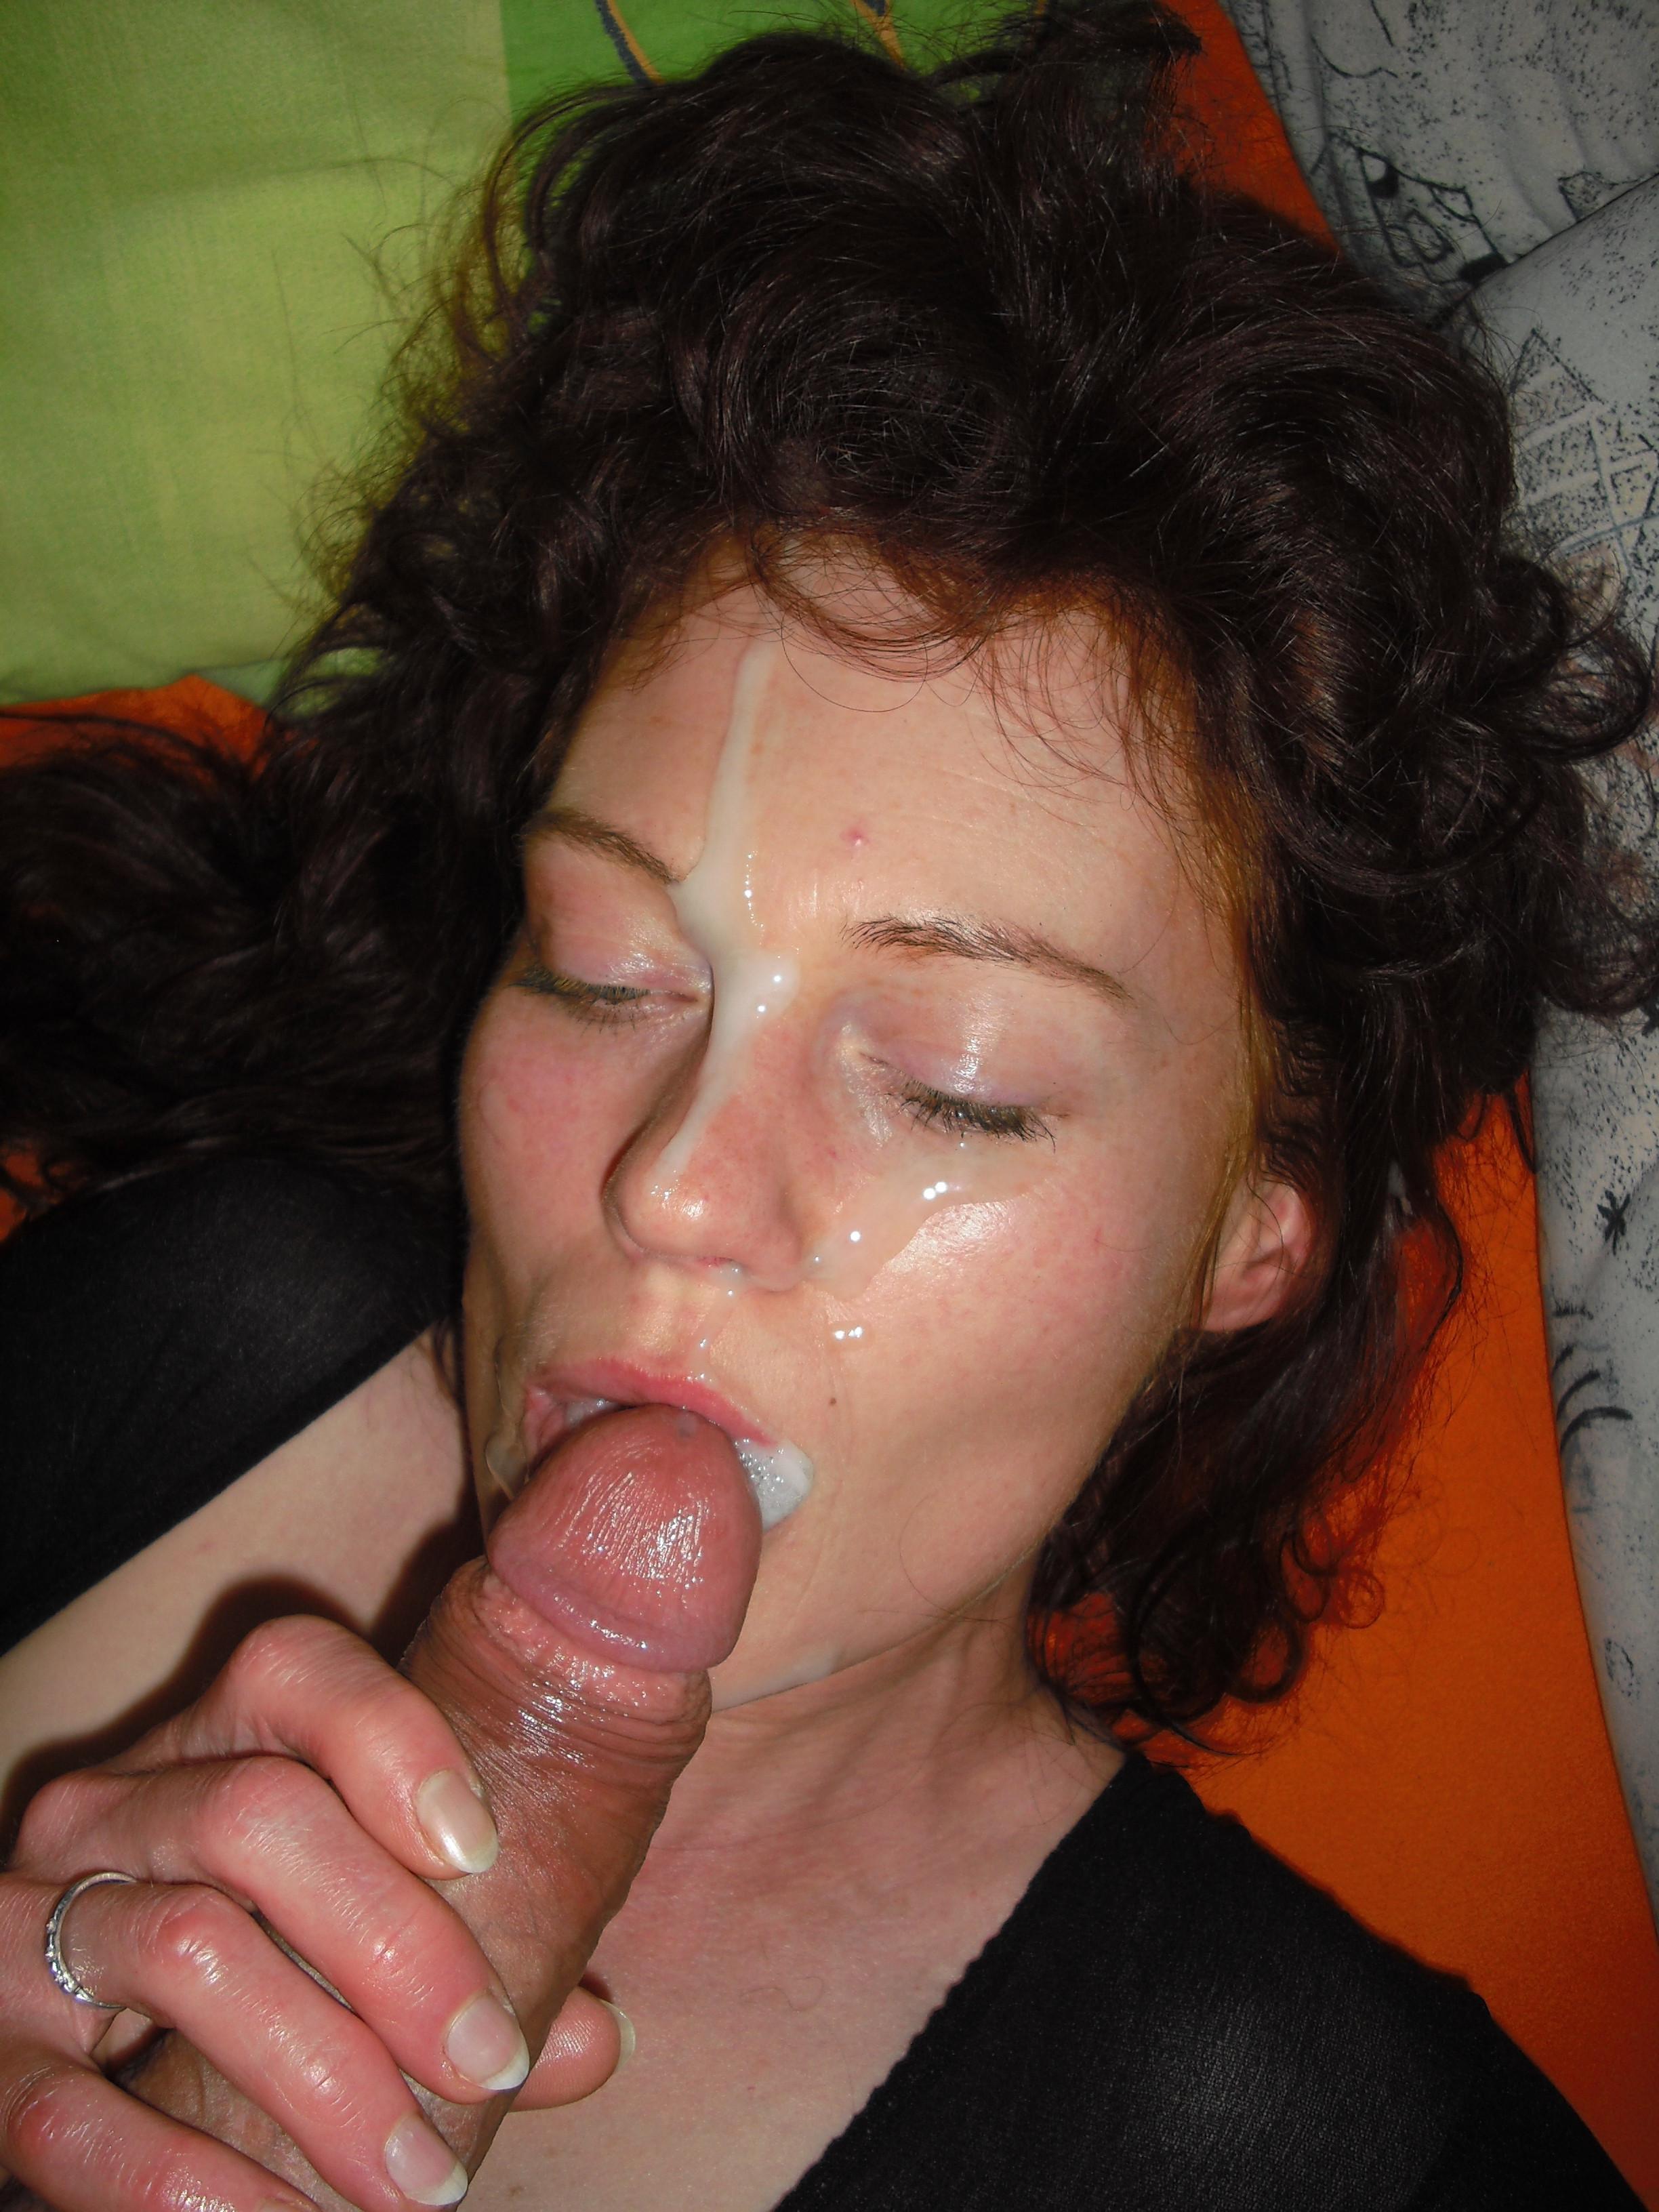 моя жена порно фото сперма - 13